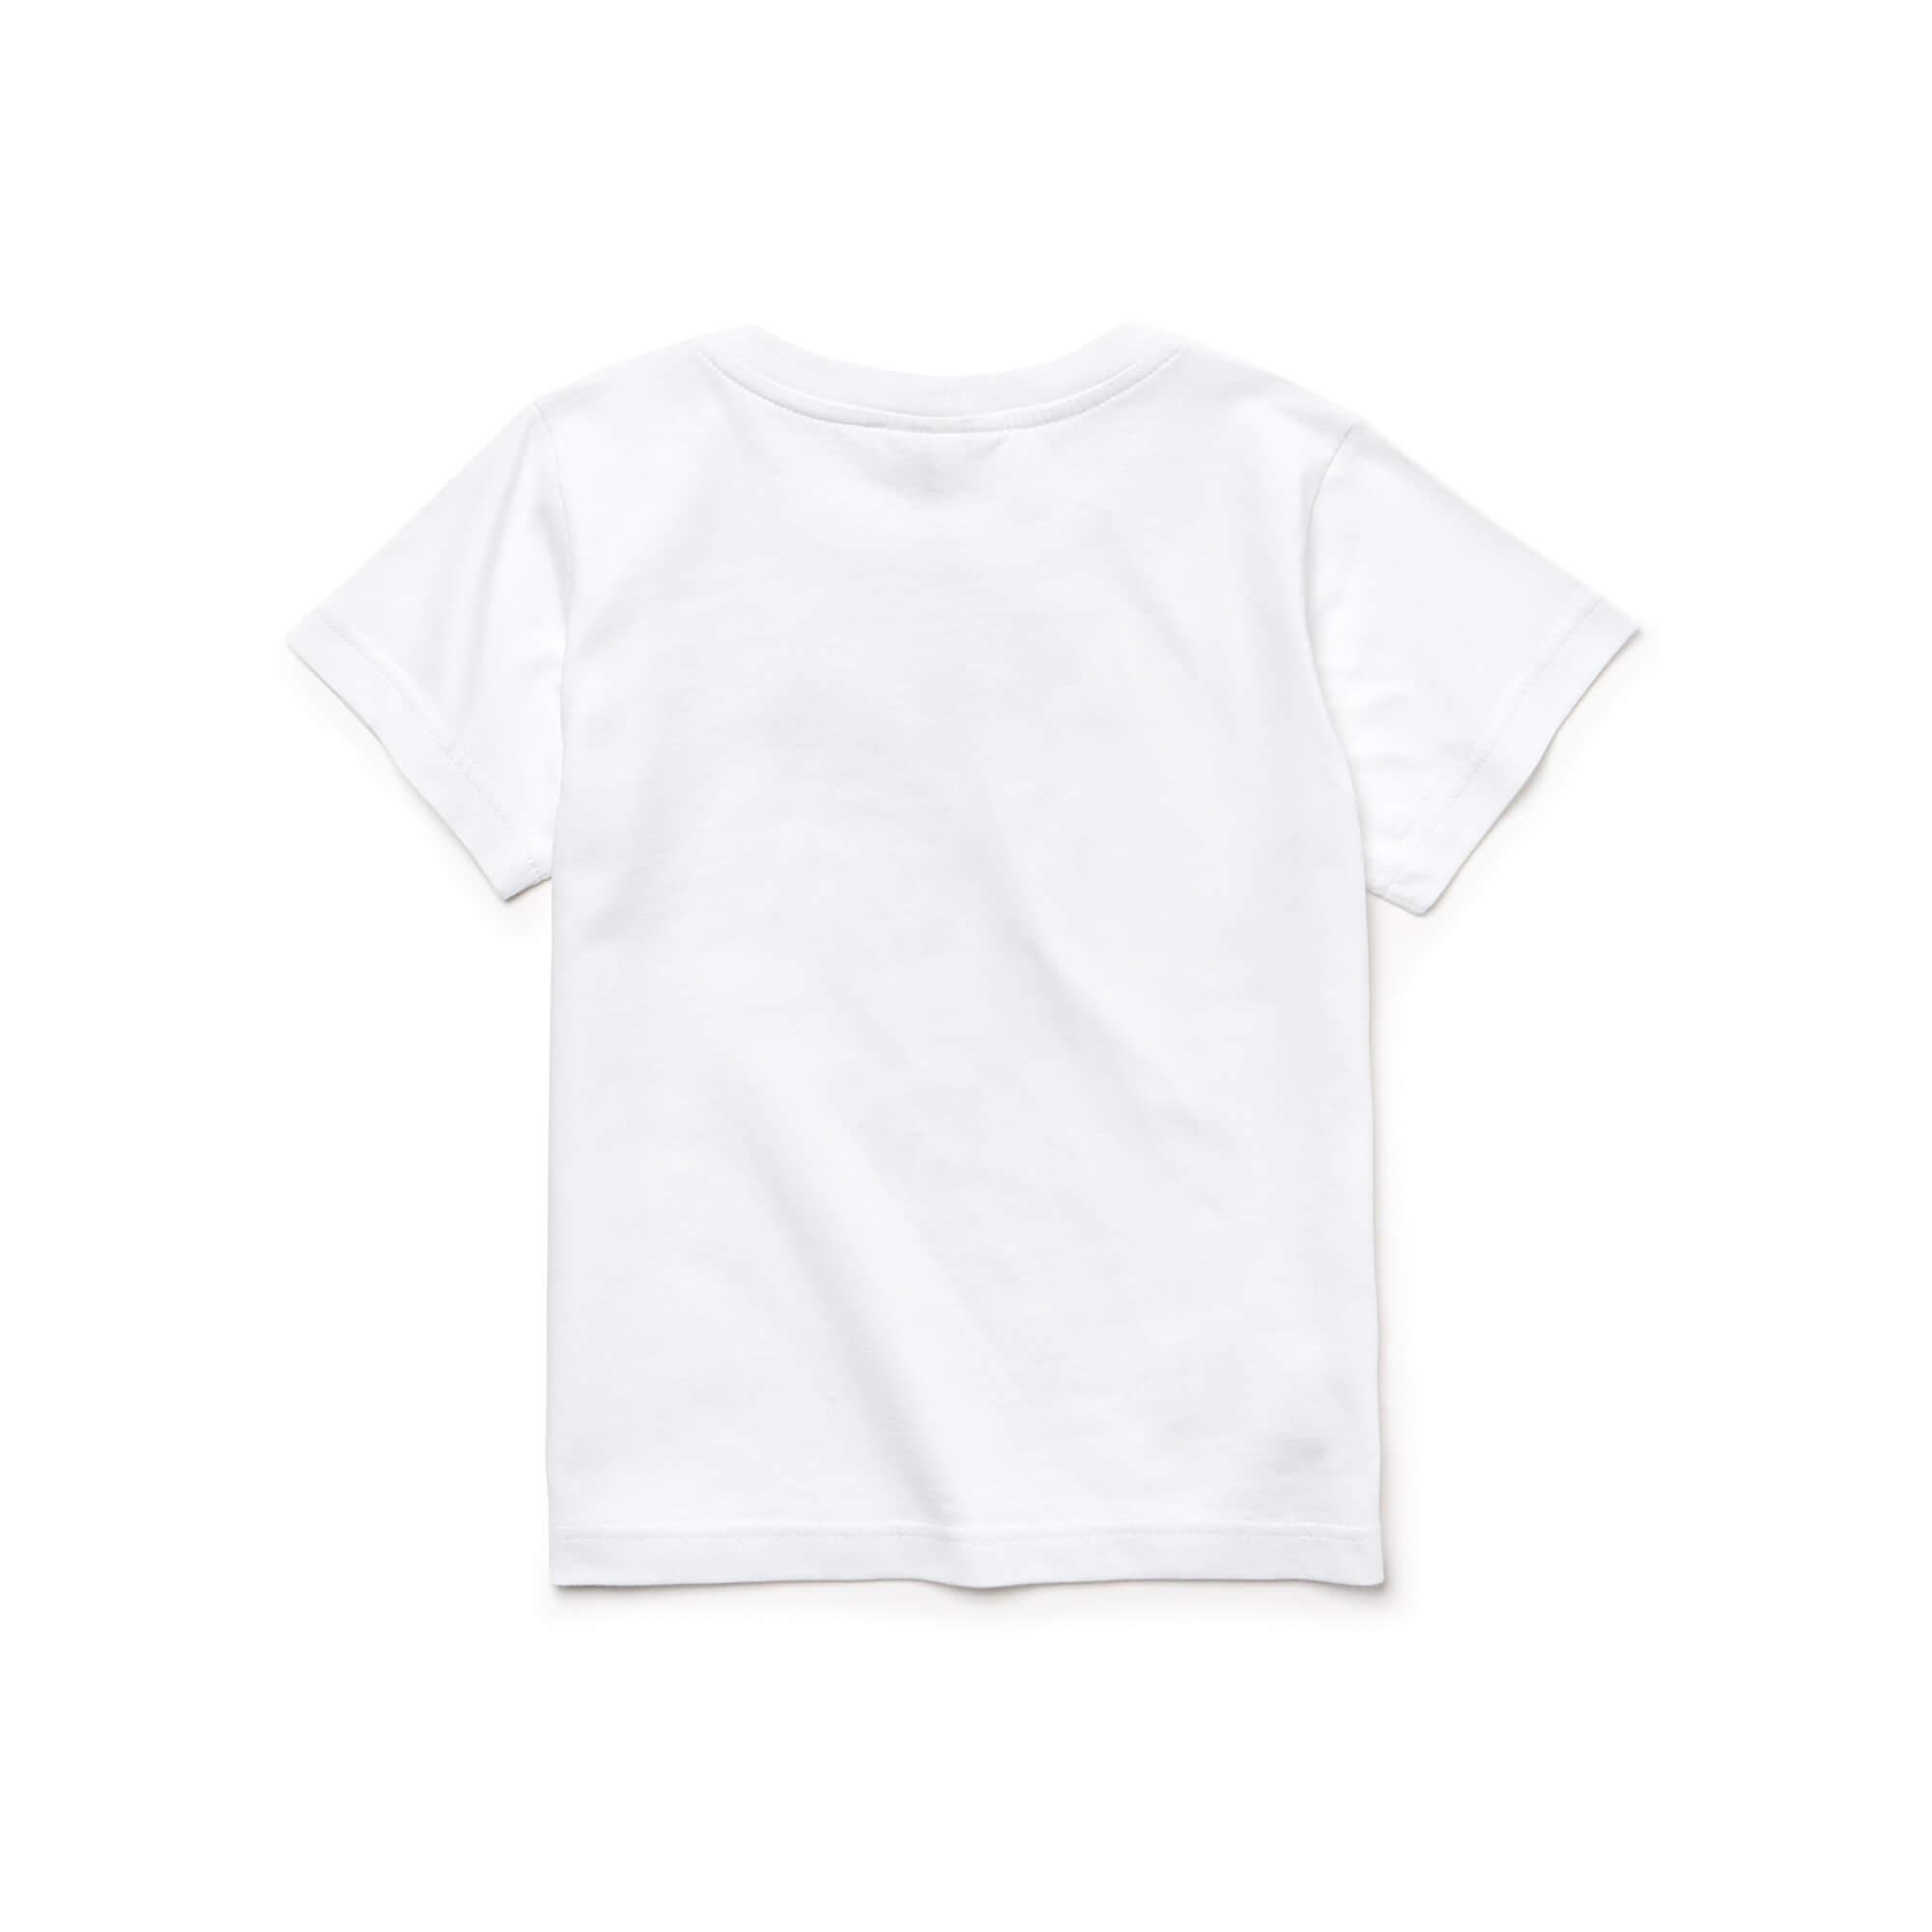 Lacoste Erkek Çocuk T-Shirt